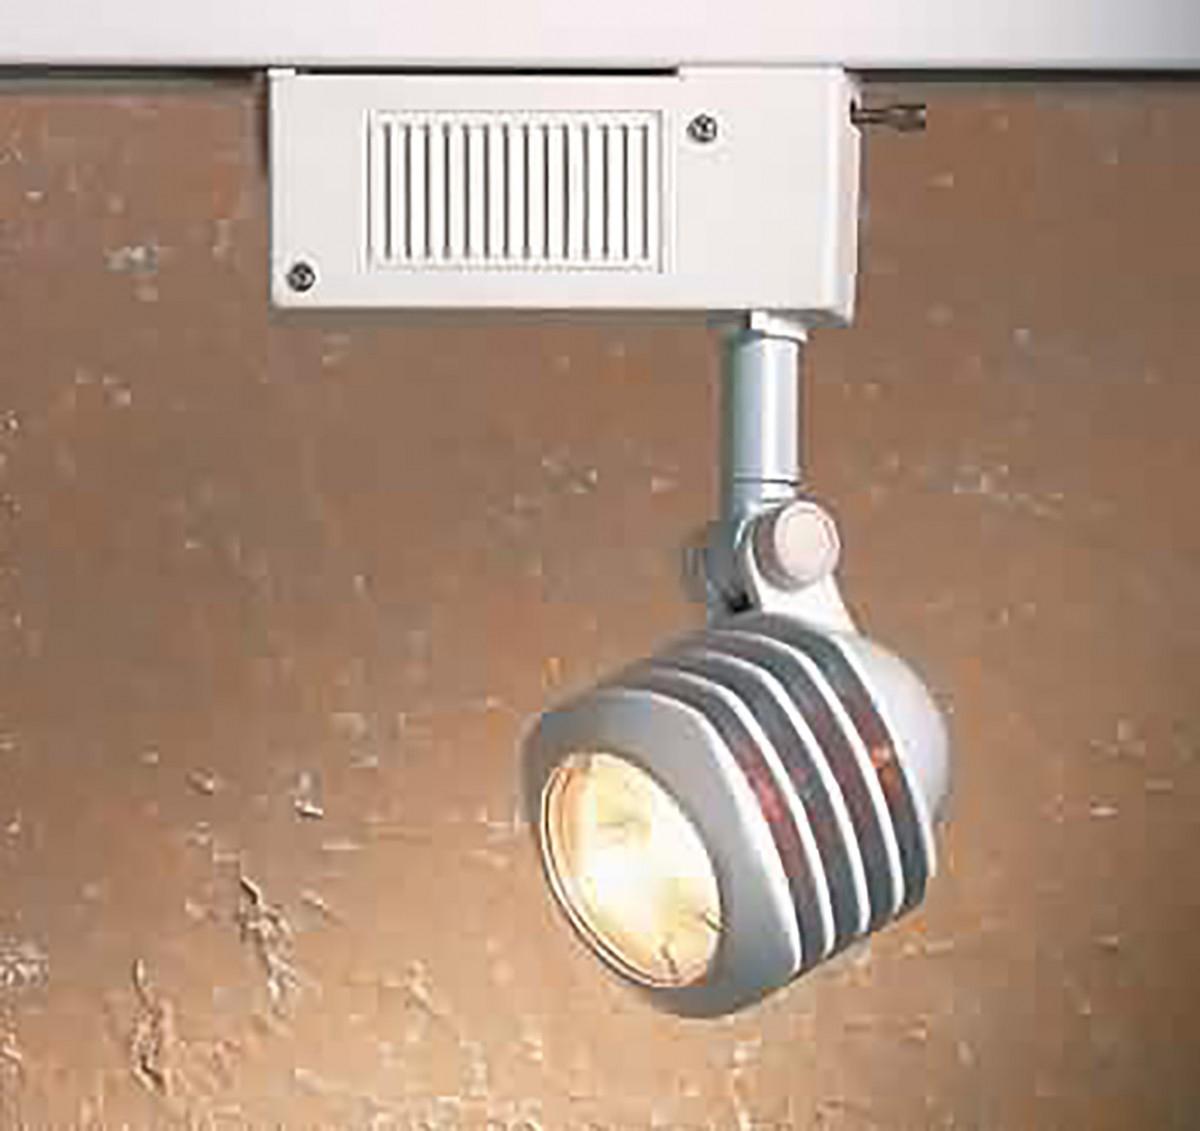 Track Lighting White Accordian Track Light 3.5L x 6H Track Light Track Lights Track Lighting